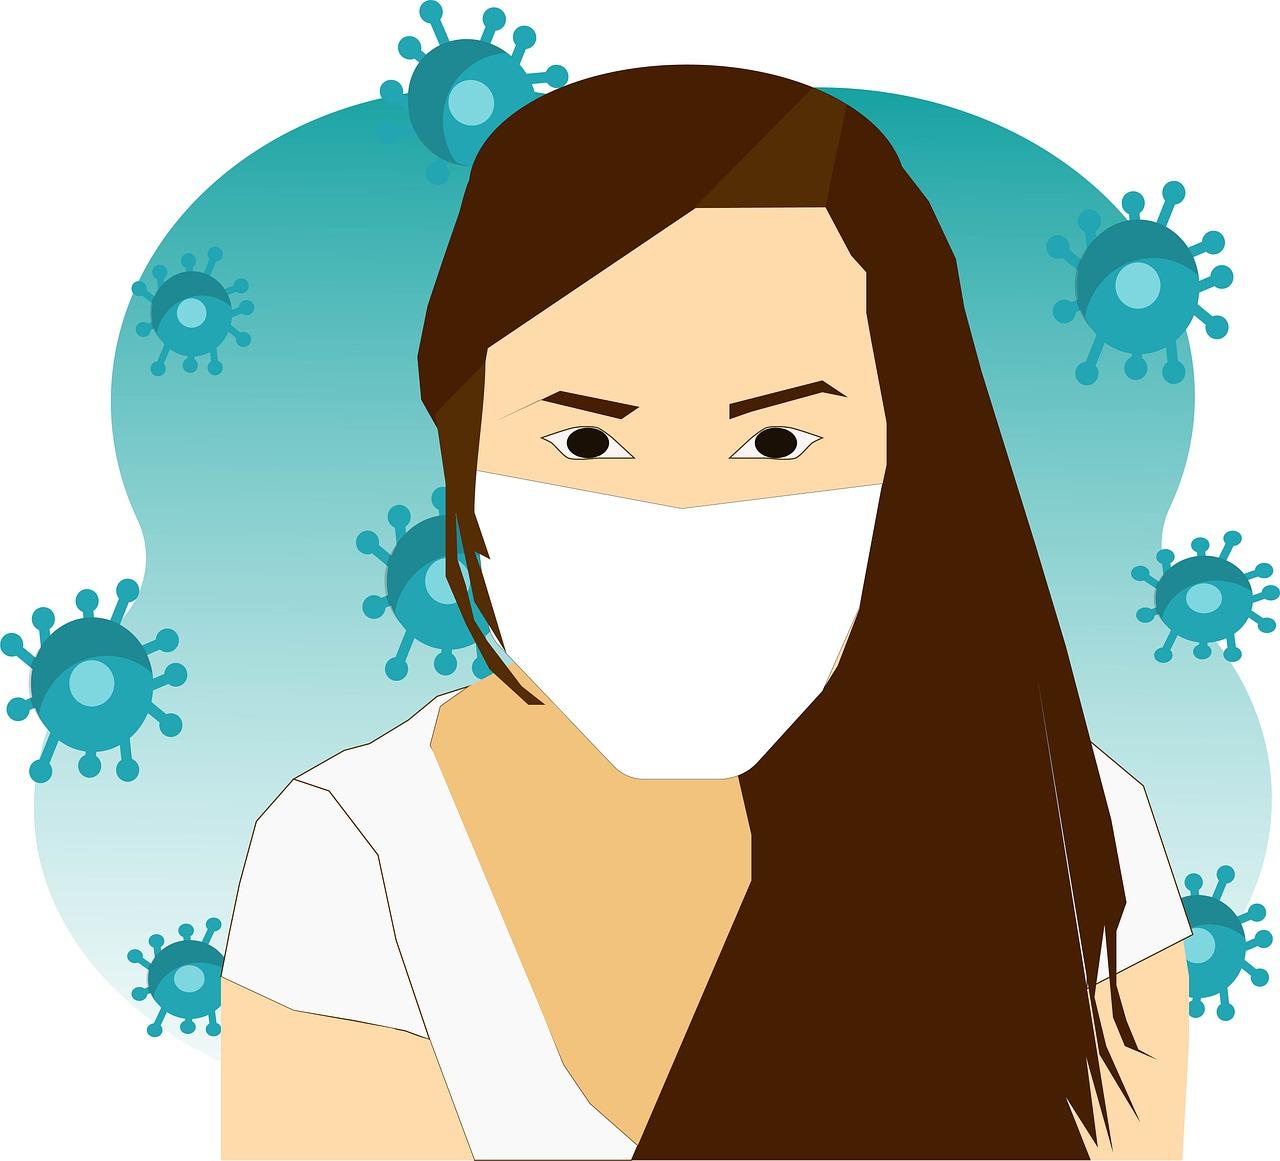 Mask Facemask Woman - Free image on Pixabay